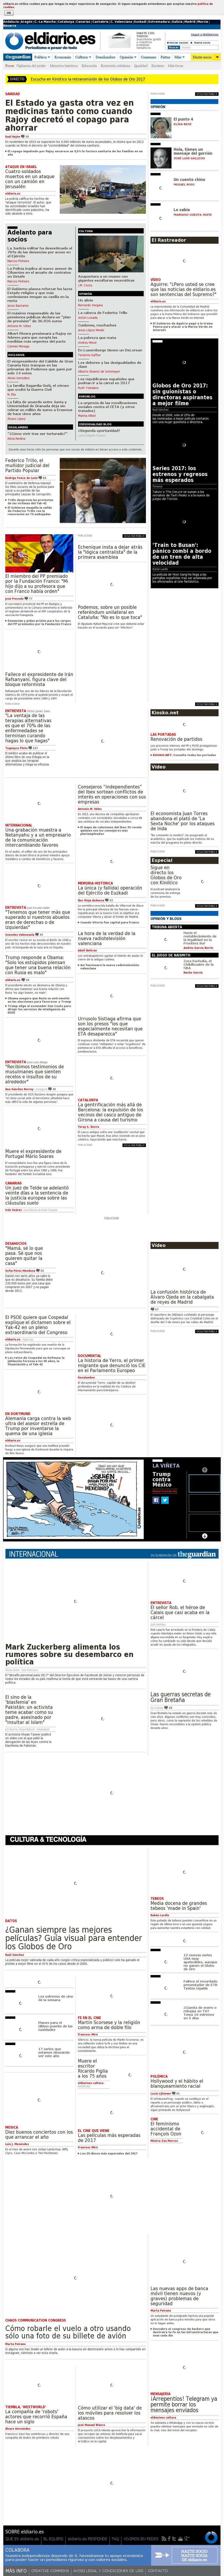 El Diario at Monday Jan. 9, 2017, 12:03 a.m. UTC